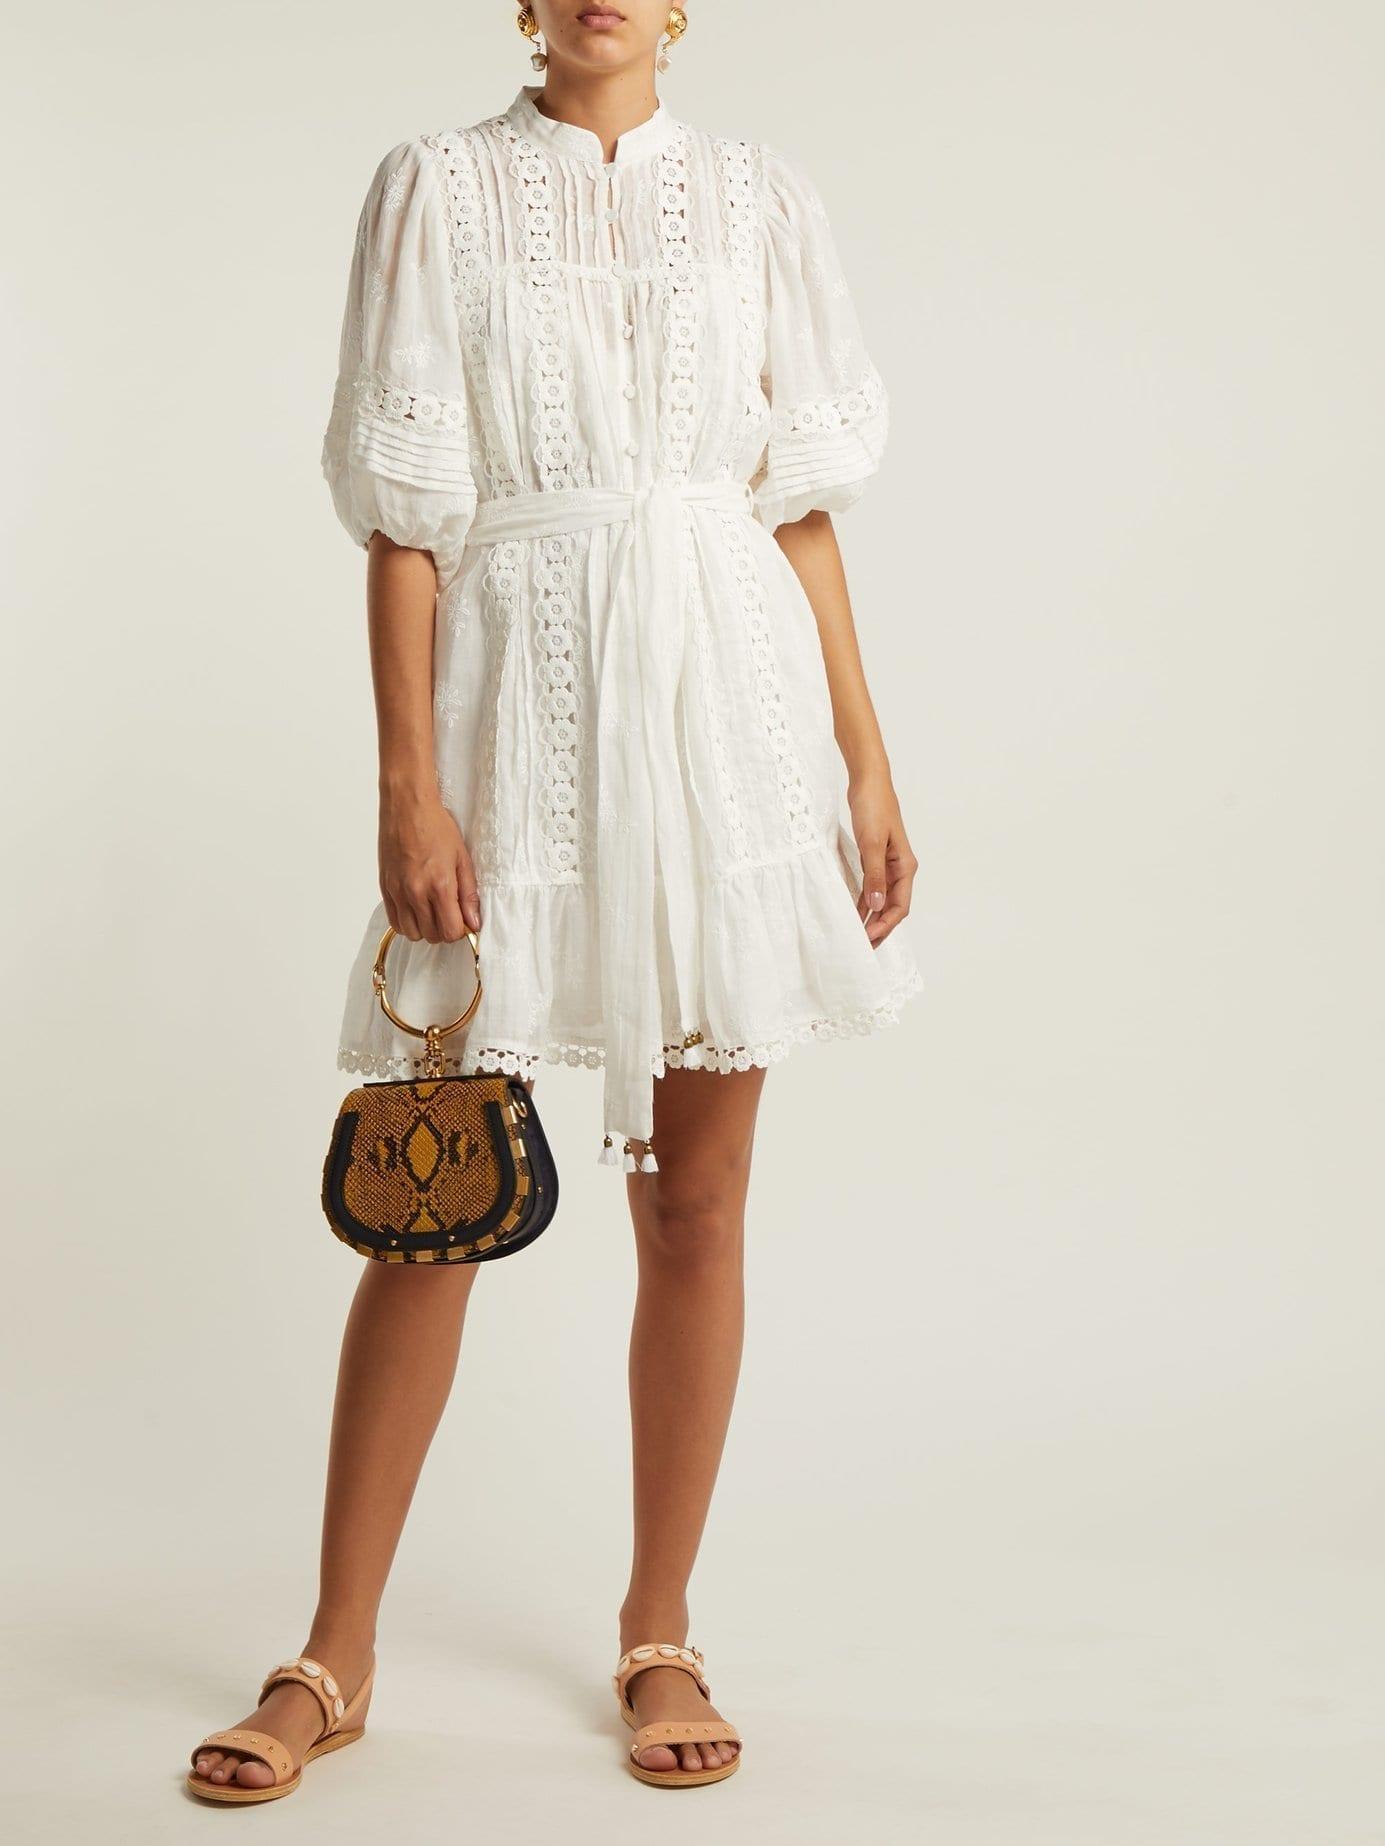 ZIMMERMANN Castile Flower Lace-trimmed Voile White Dress